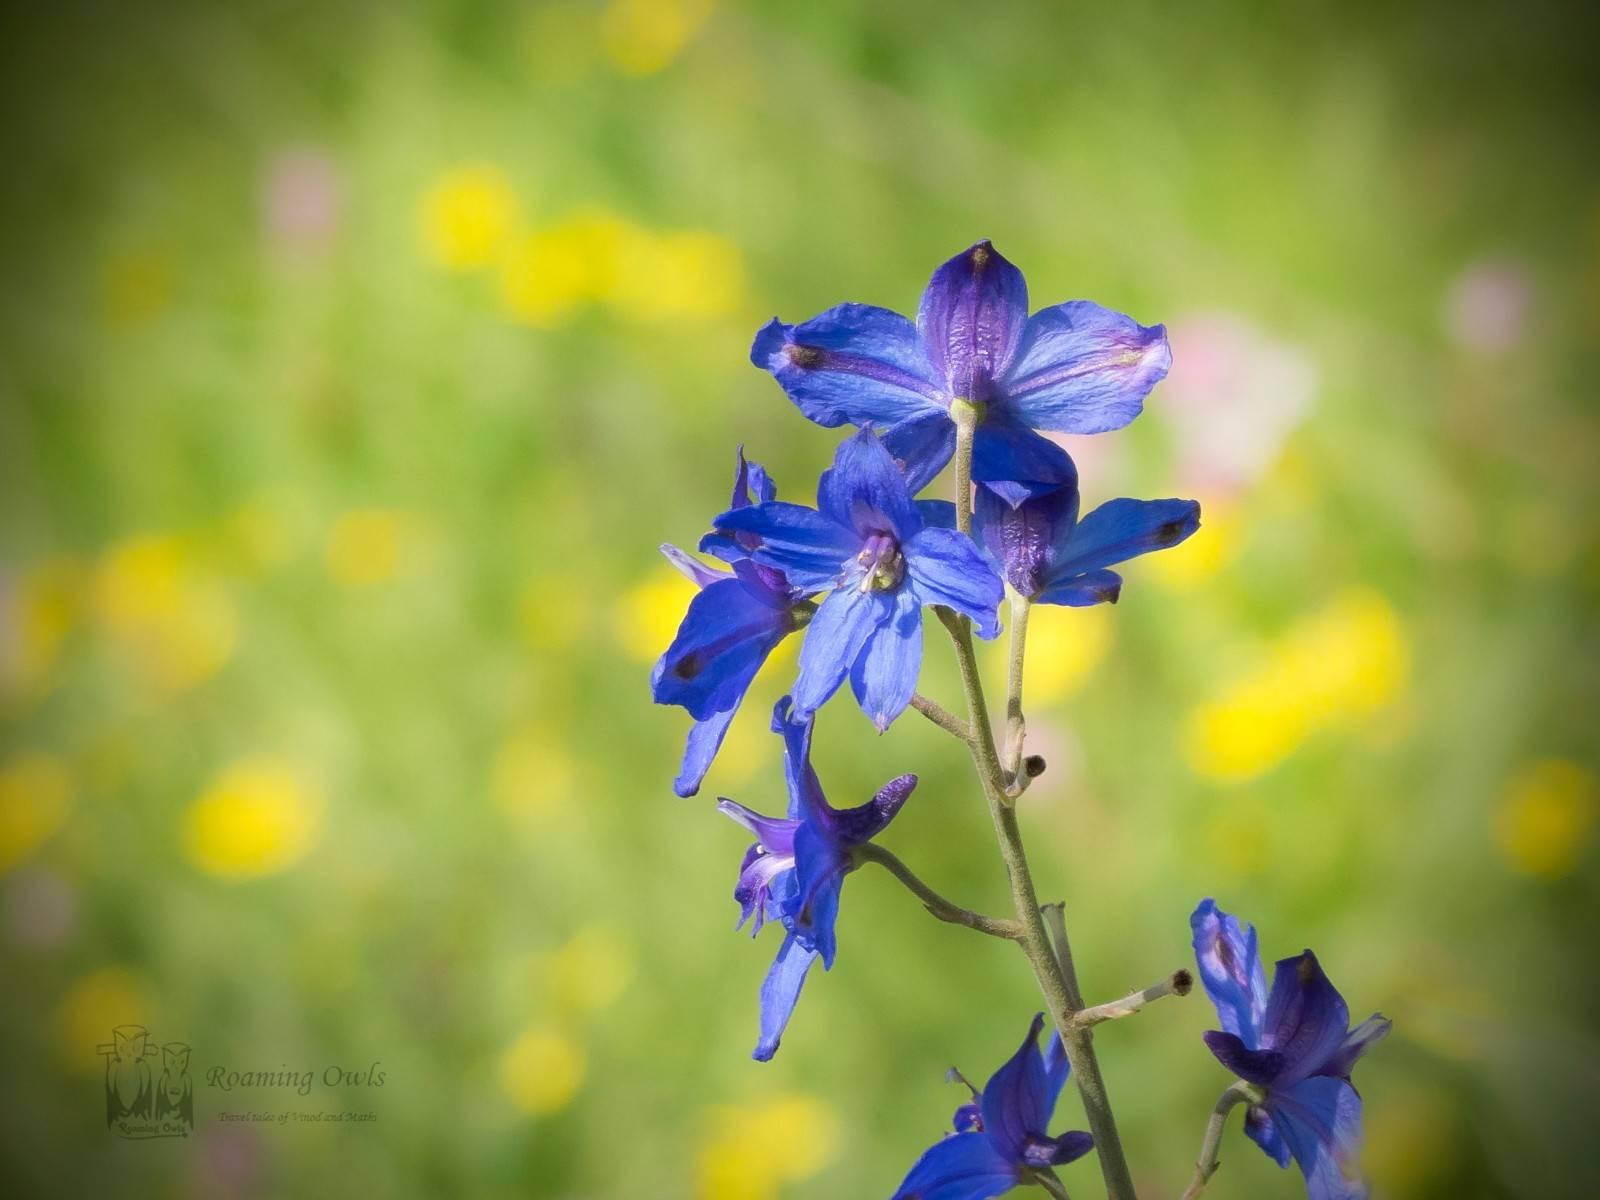 Kaas wildflower,Kaas plateau flowers,Delphinium malabaricum, Malabar Delphinium